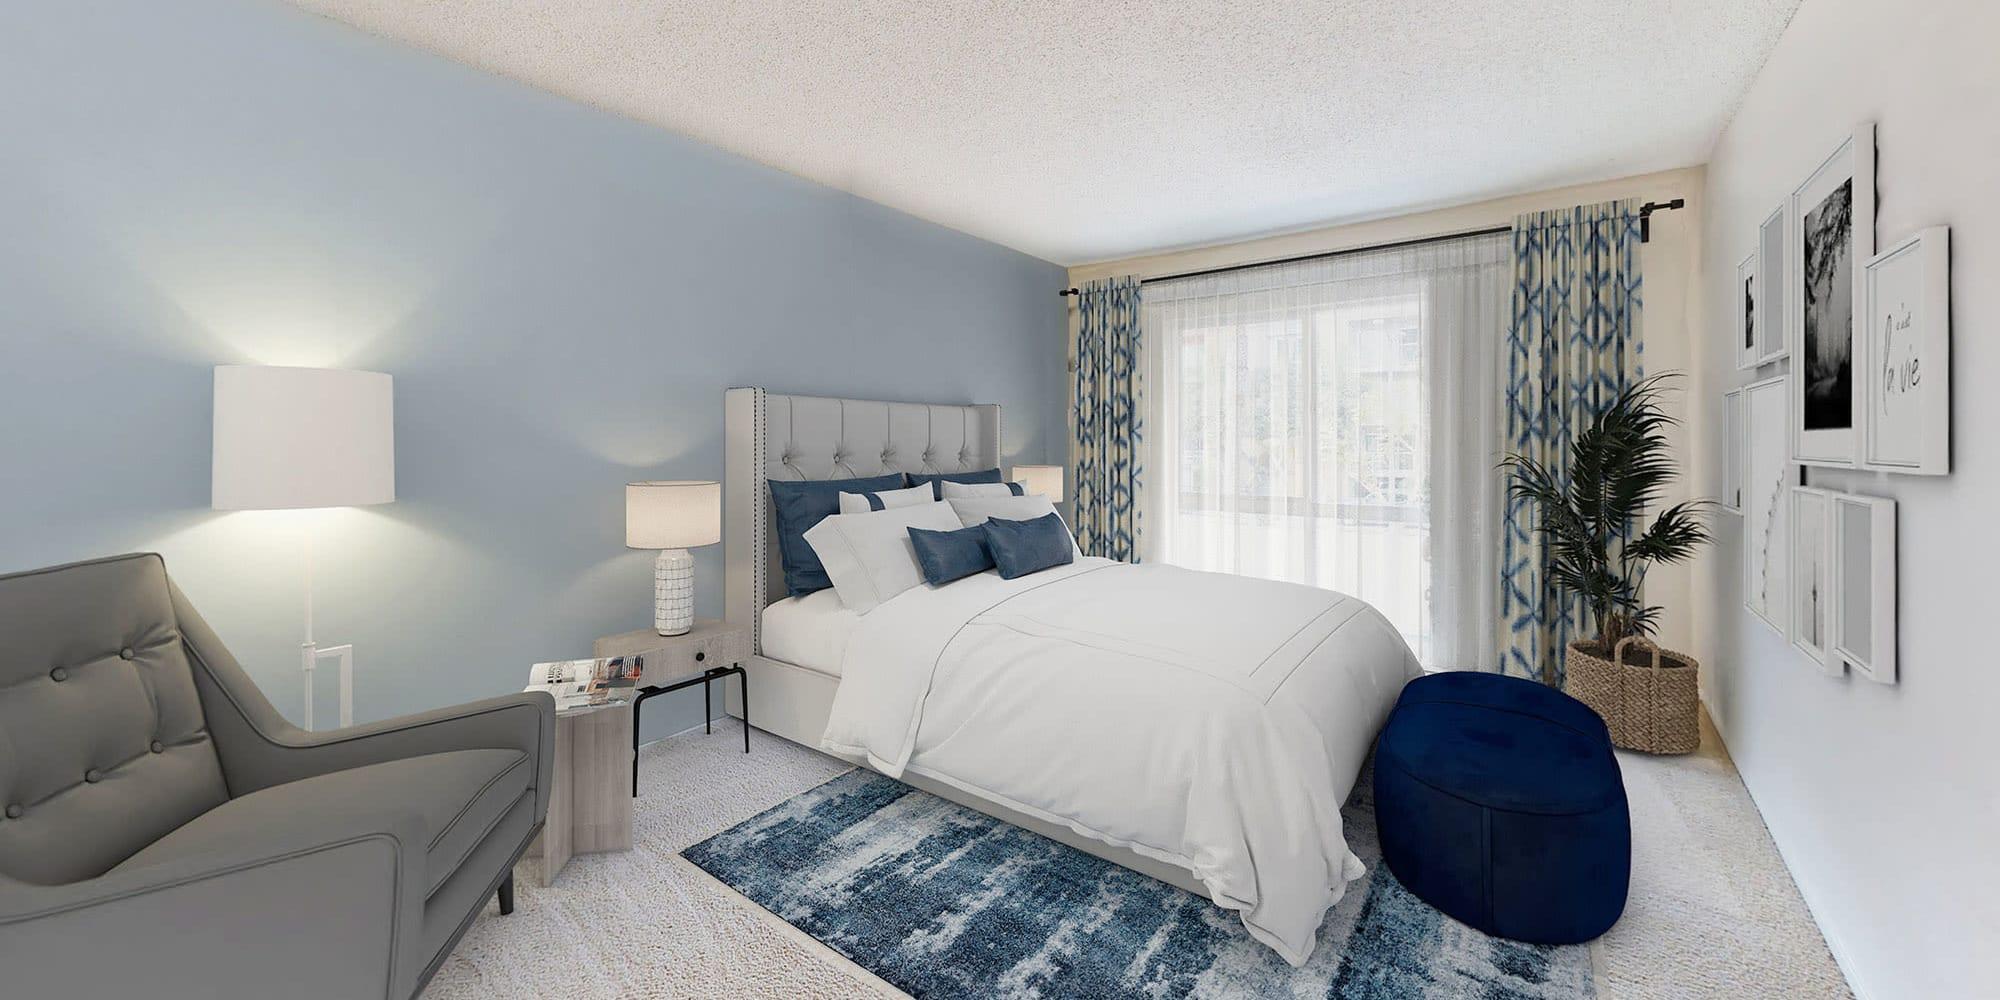 Bedroom with a view at The Tides at Marina Harbor in Marina del Rey, California